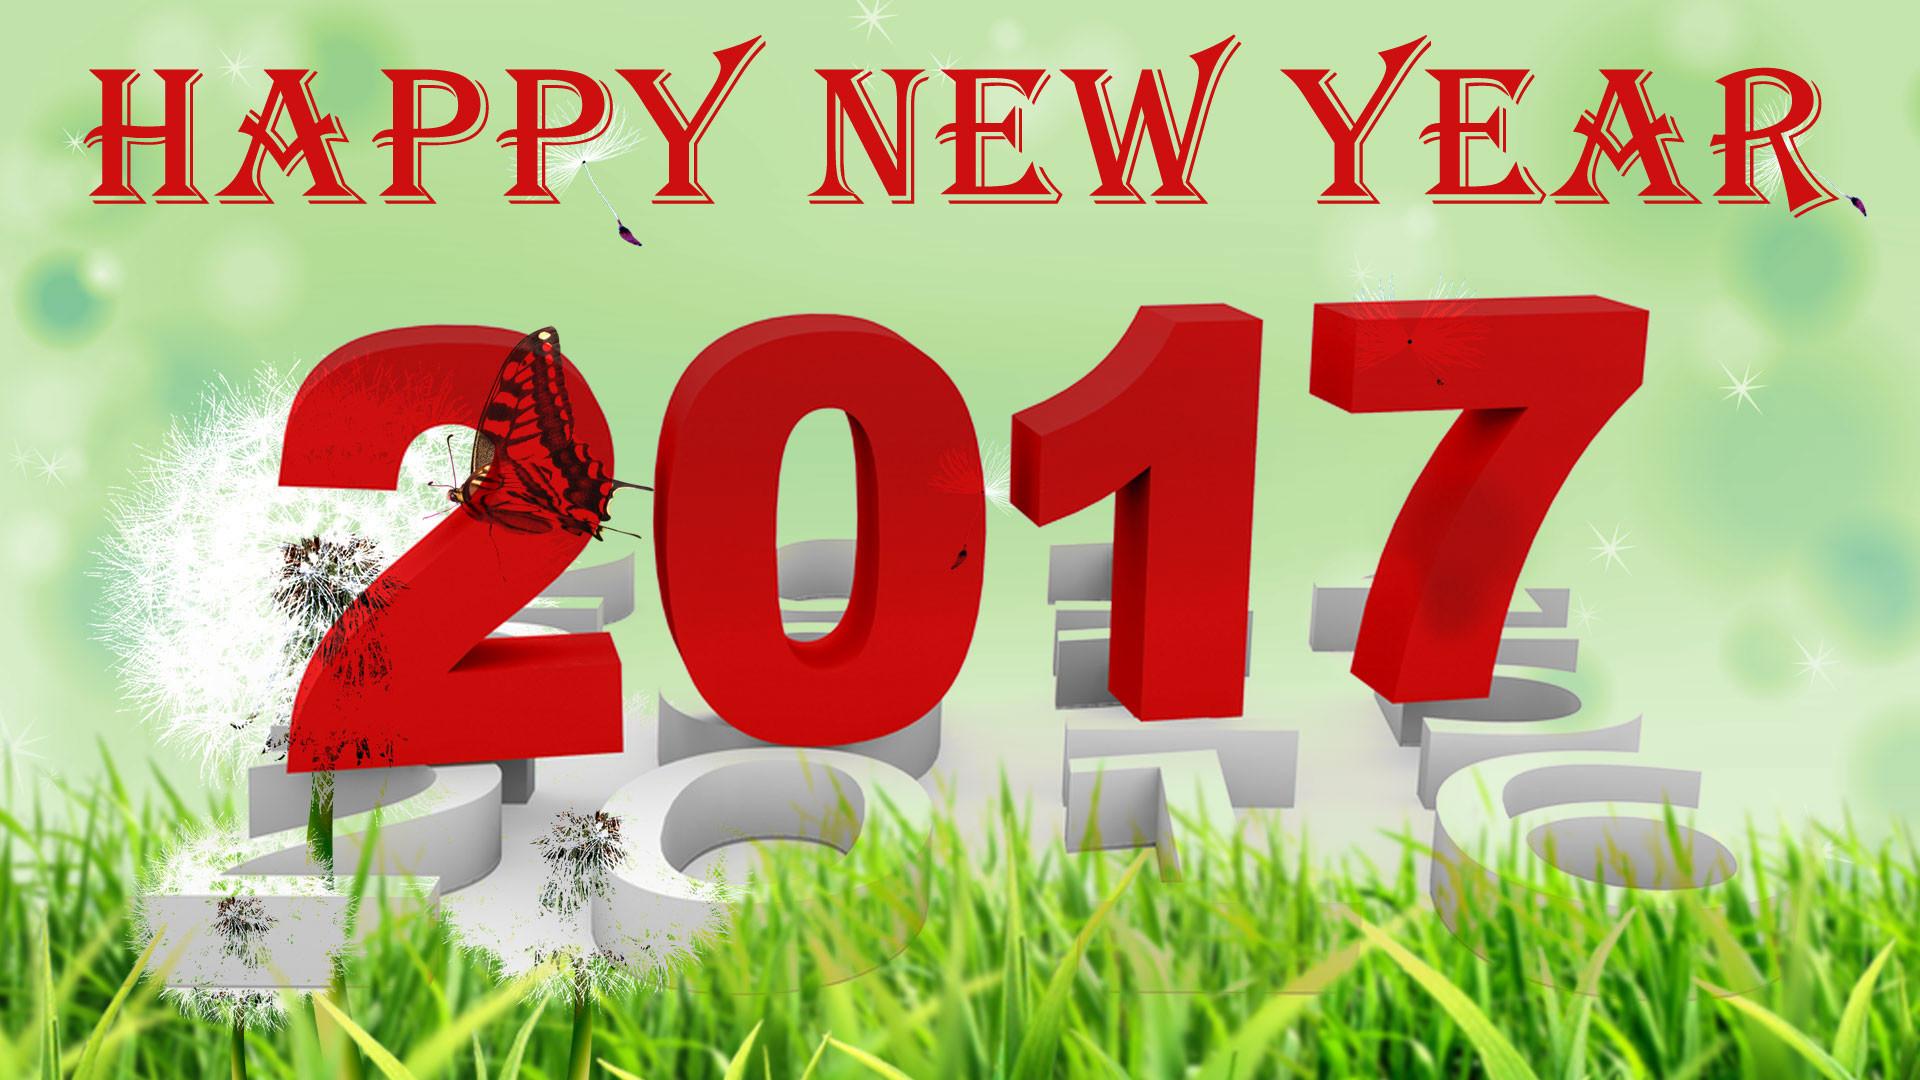 Happy New Year 2017 happy new Year 2017